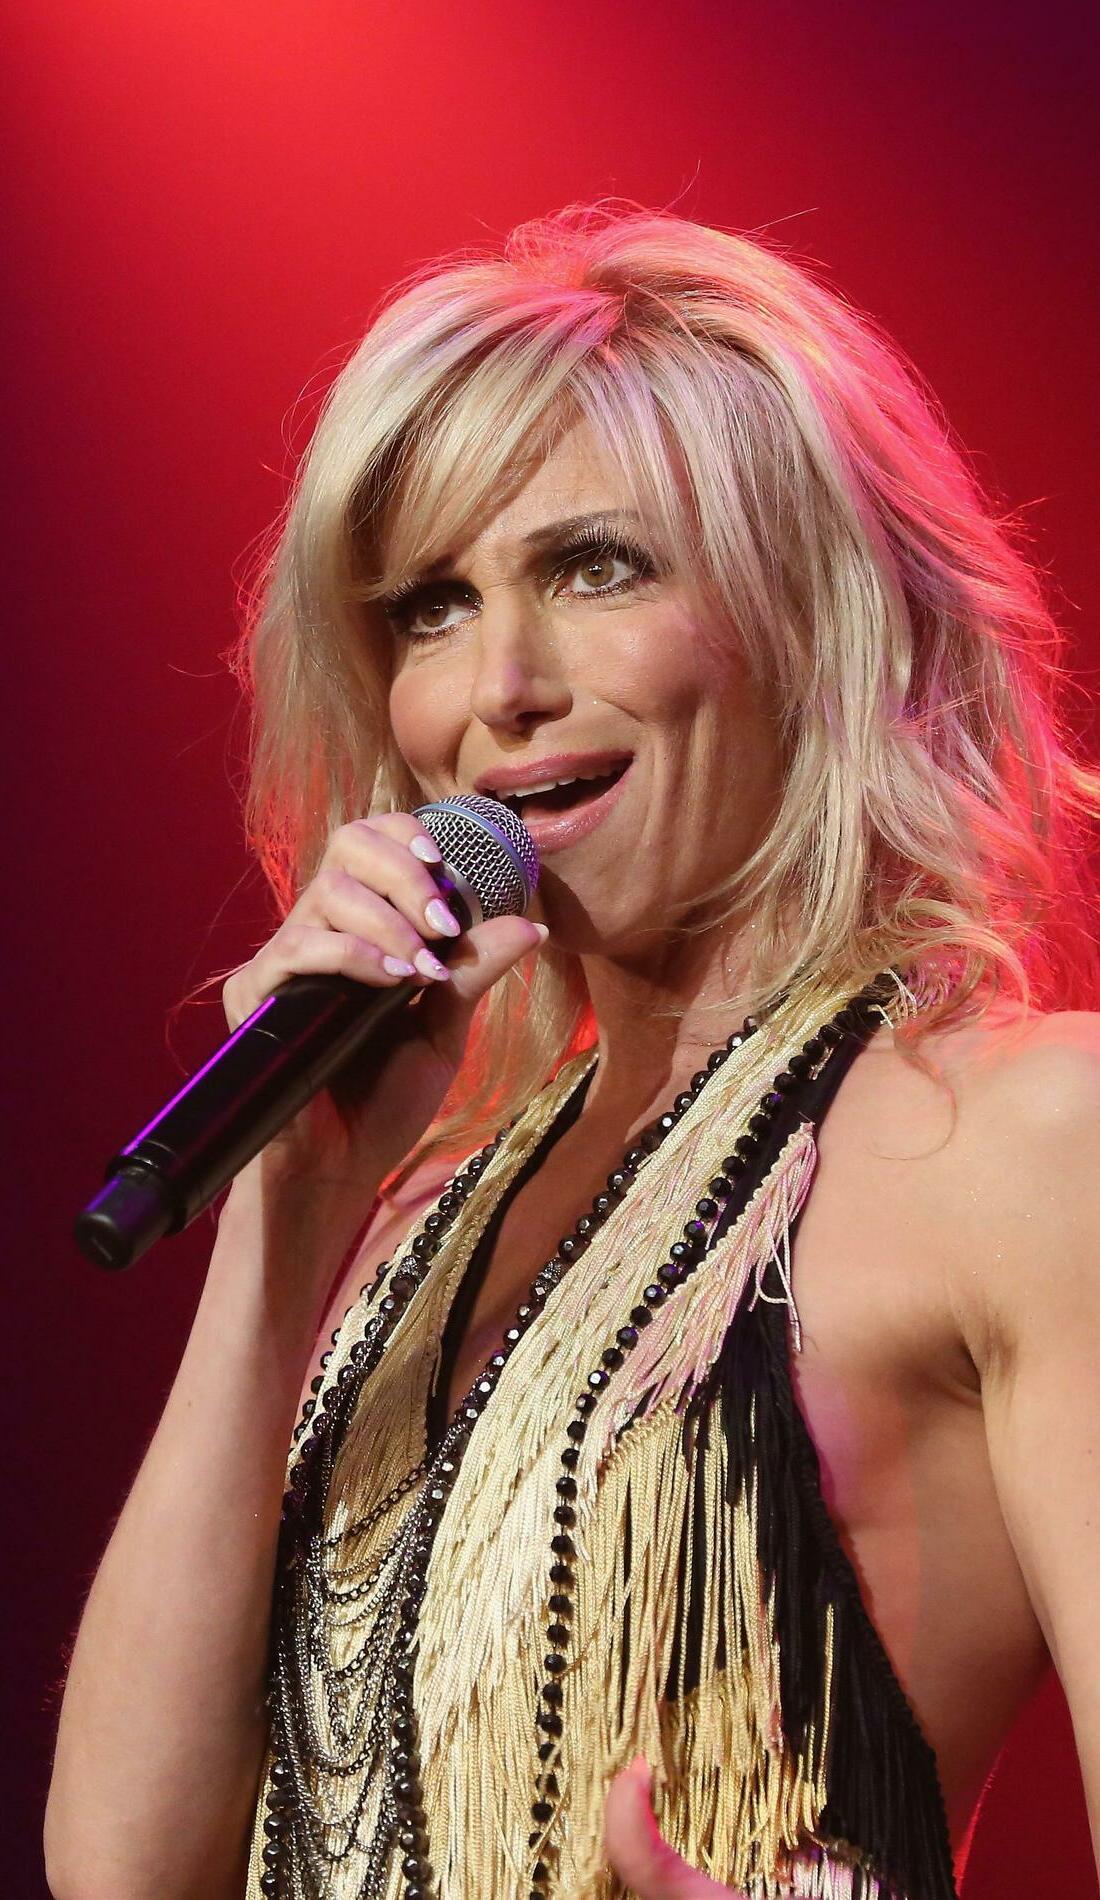 A Debbie Gibson live event